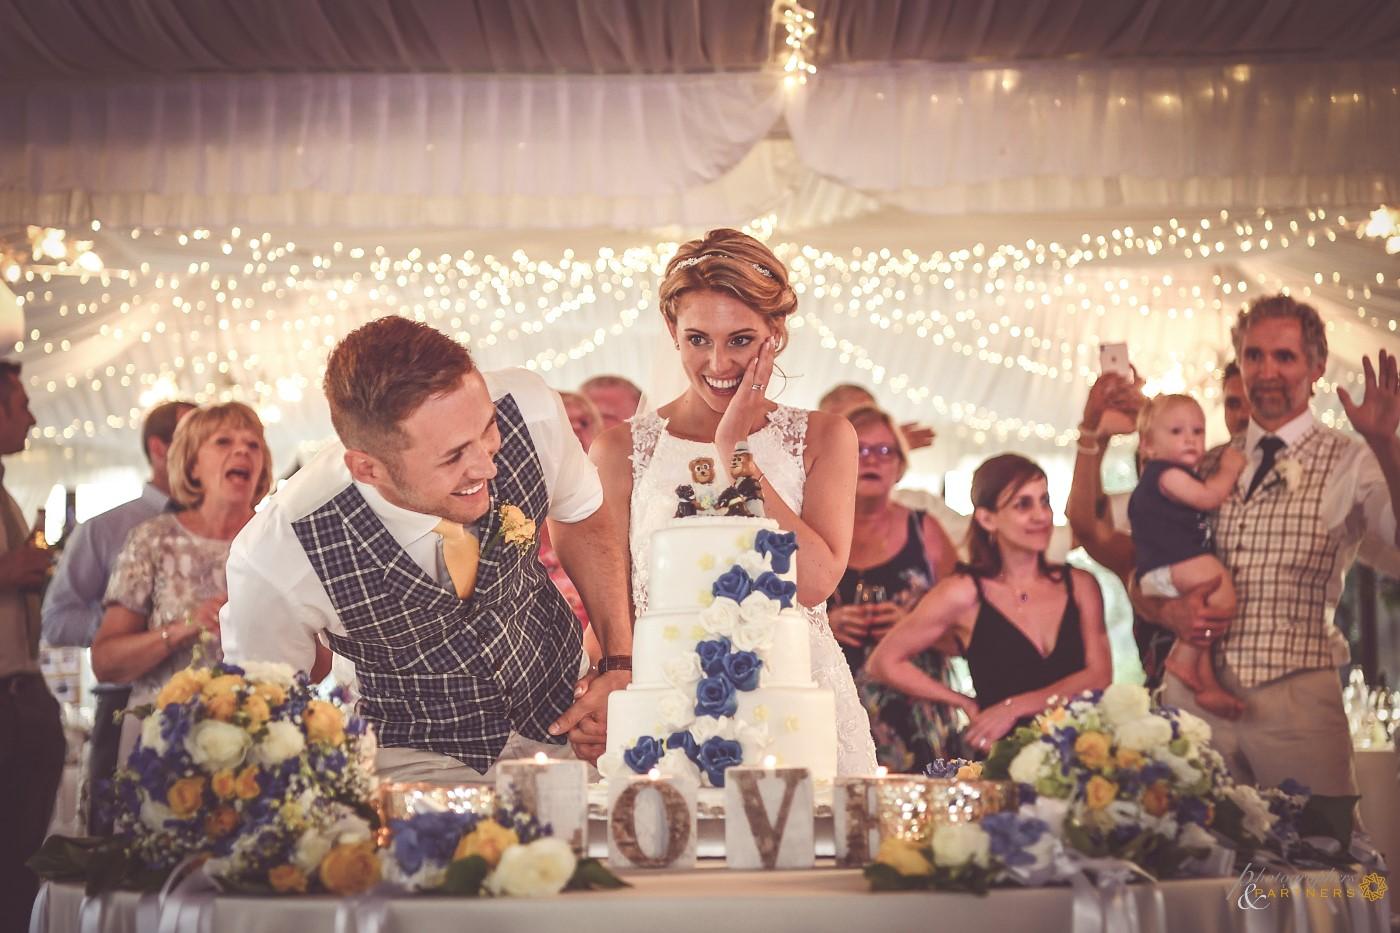 Our wedding cake 🍾